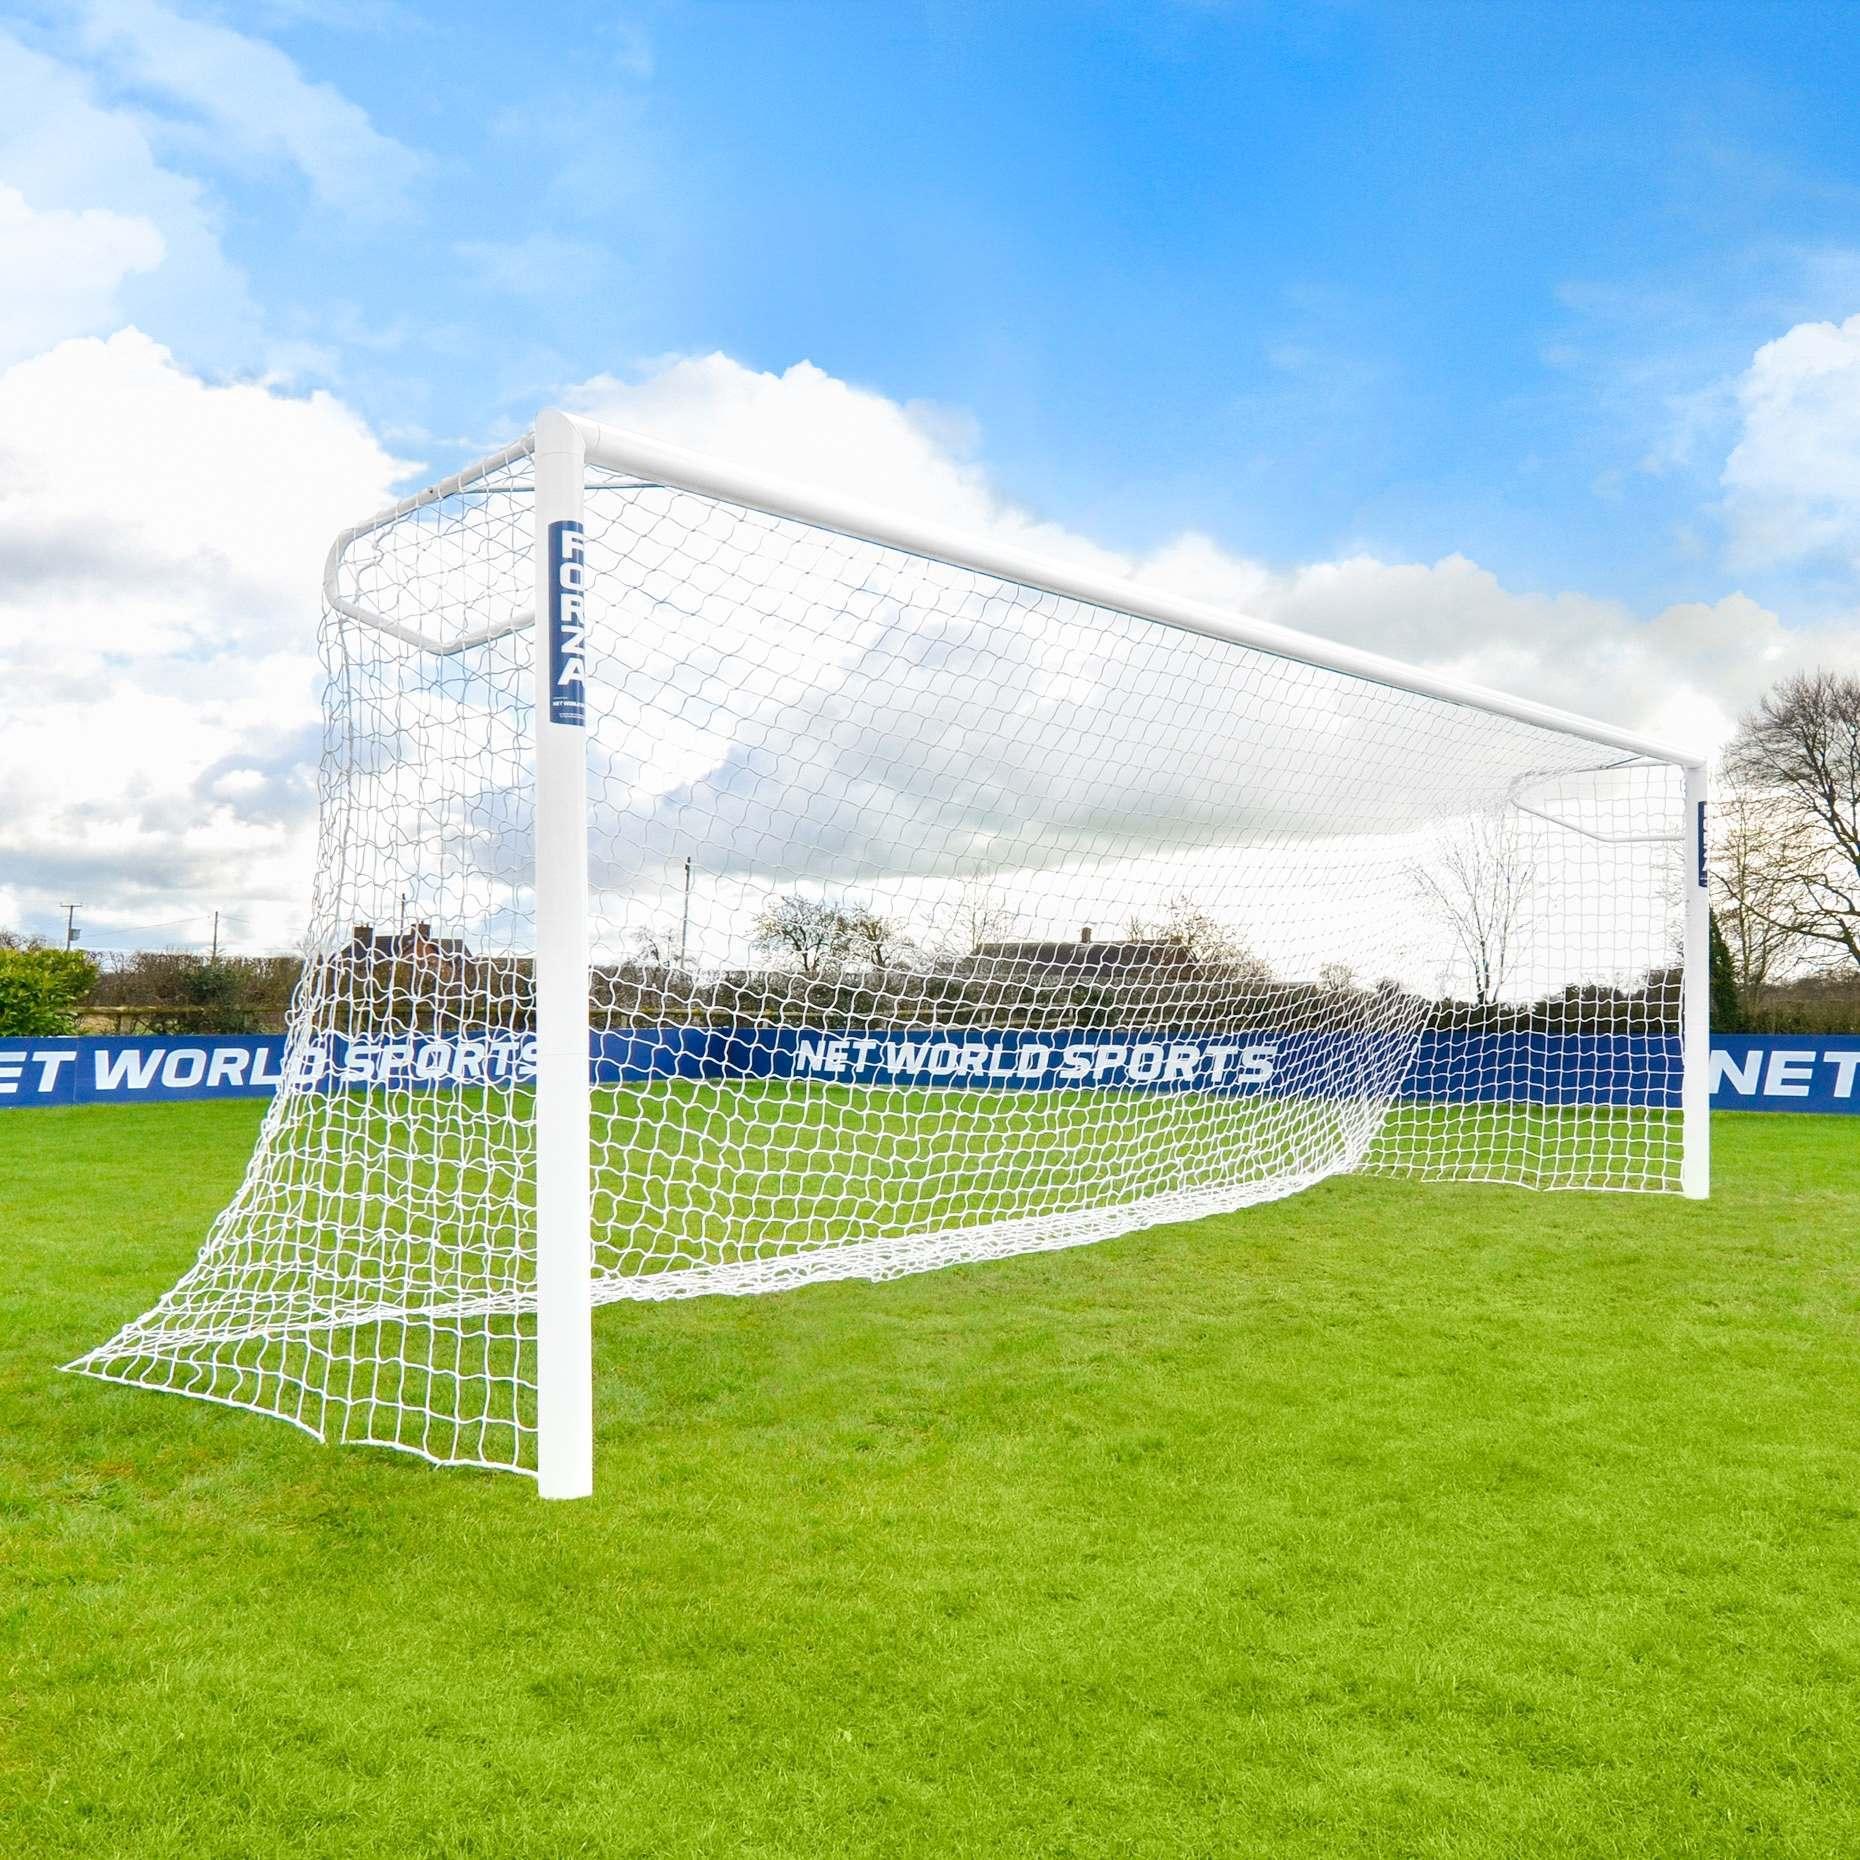 21 x 7 FORZA Alu110 Socketed Football Goal